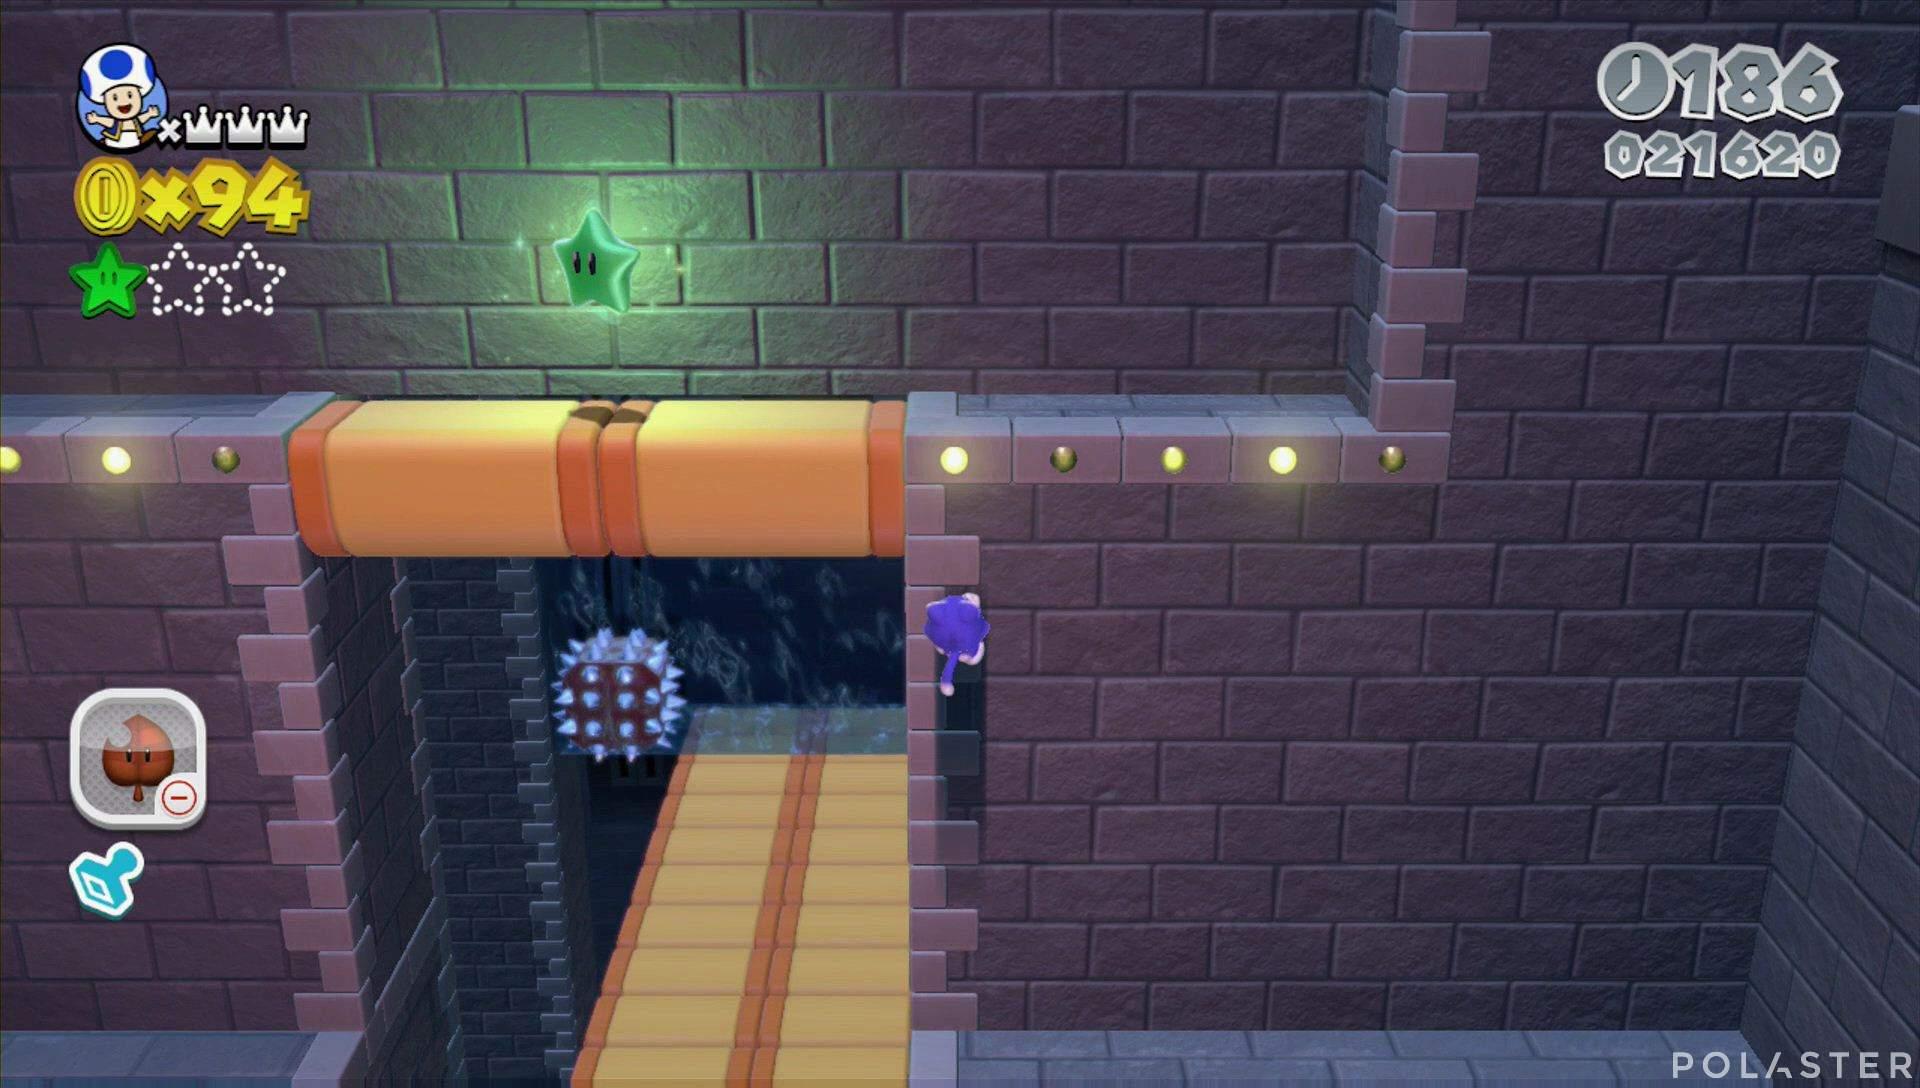 Super Mario 3D World Mundo Bowser-5 Estrella 2